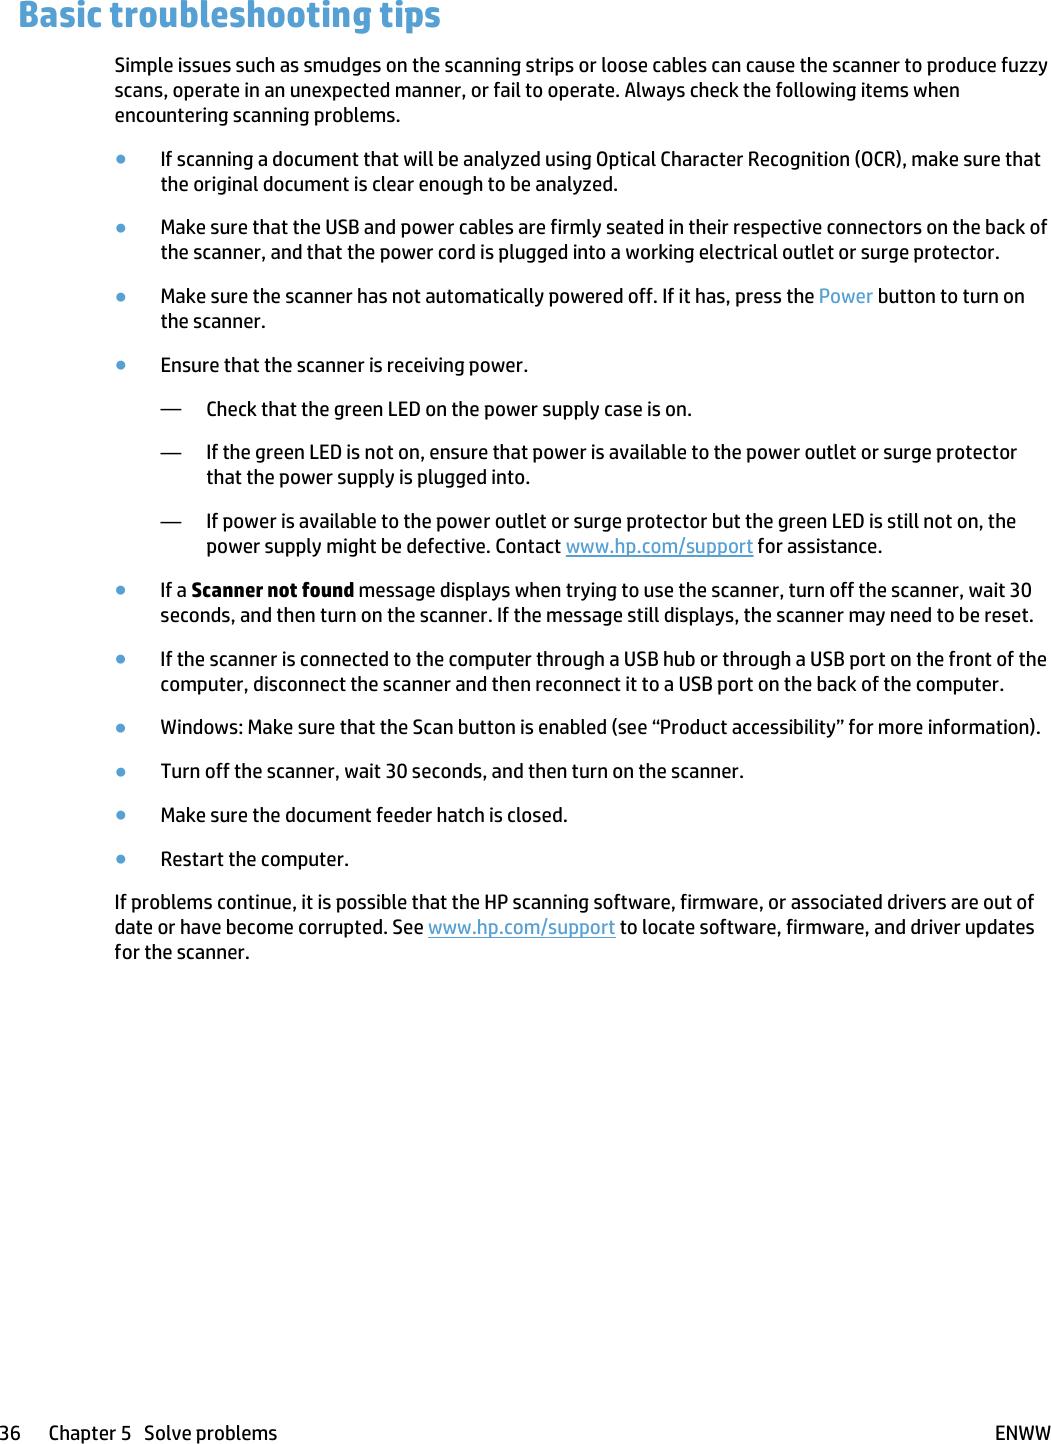 HP ScanJet Pro 4500 Fn1 Network Scanner User Guide ENWW C04894399